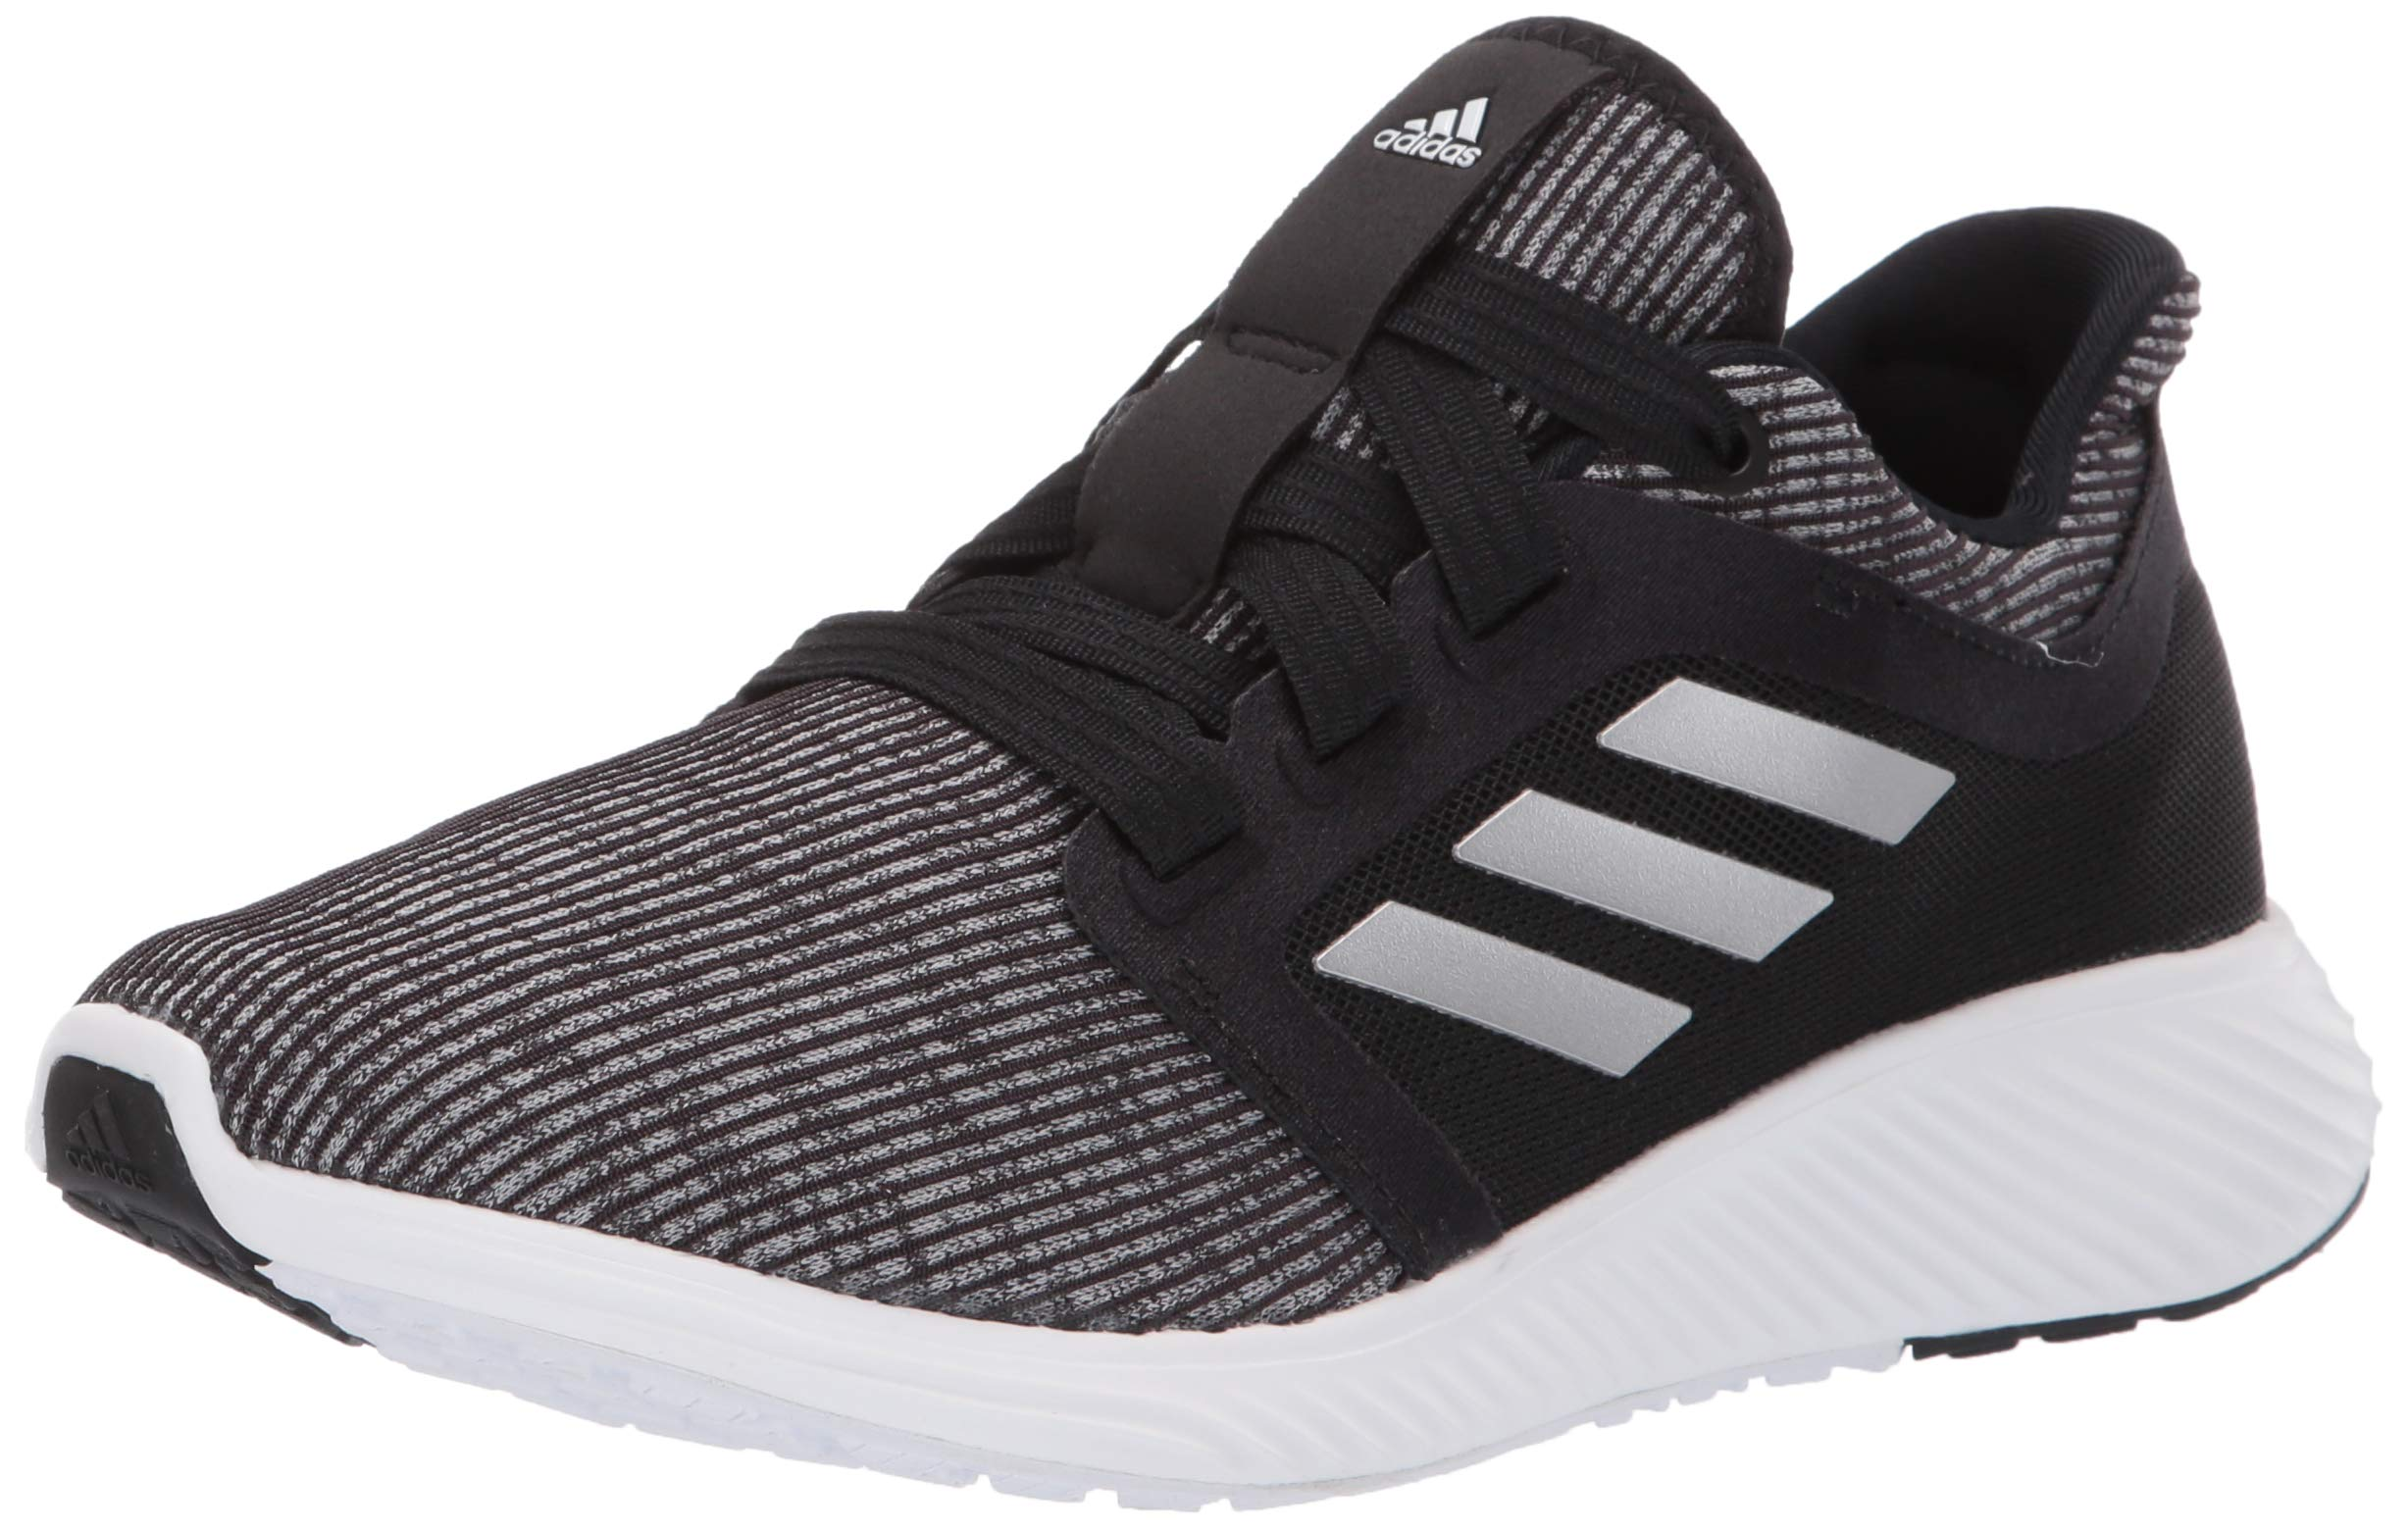 adidas Women's Edge Lux 3 Running Shoe, Silver Metallic/Black, 7.5 M US by adidas